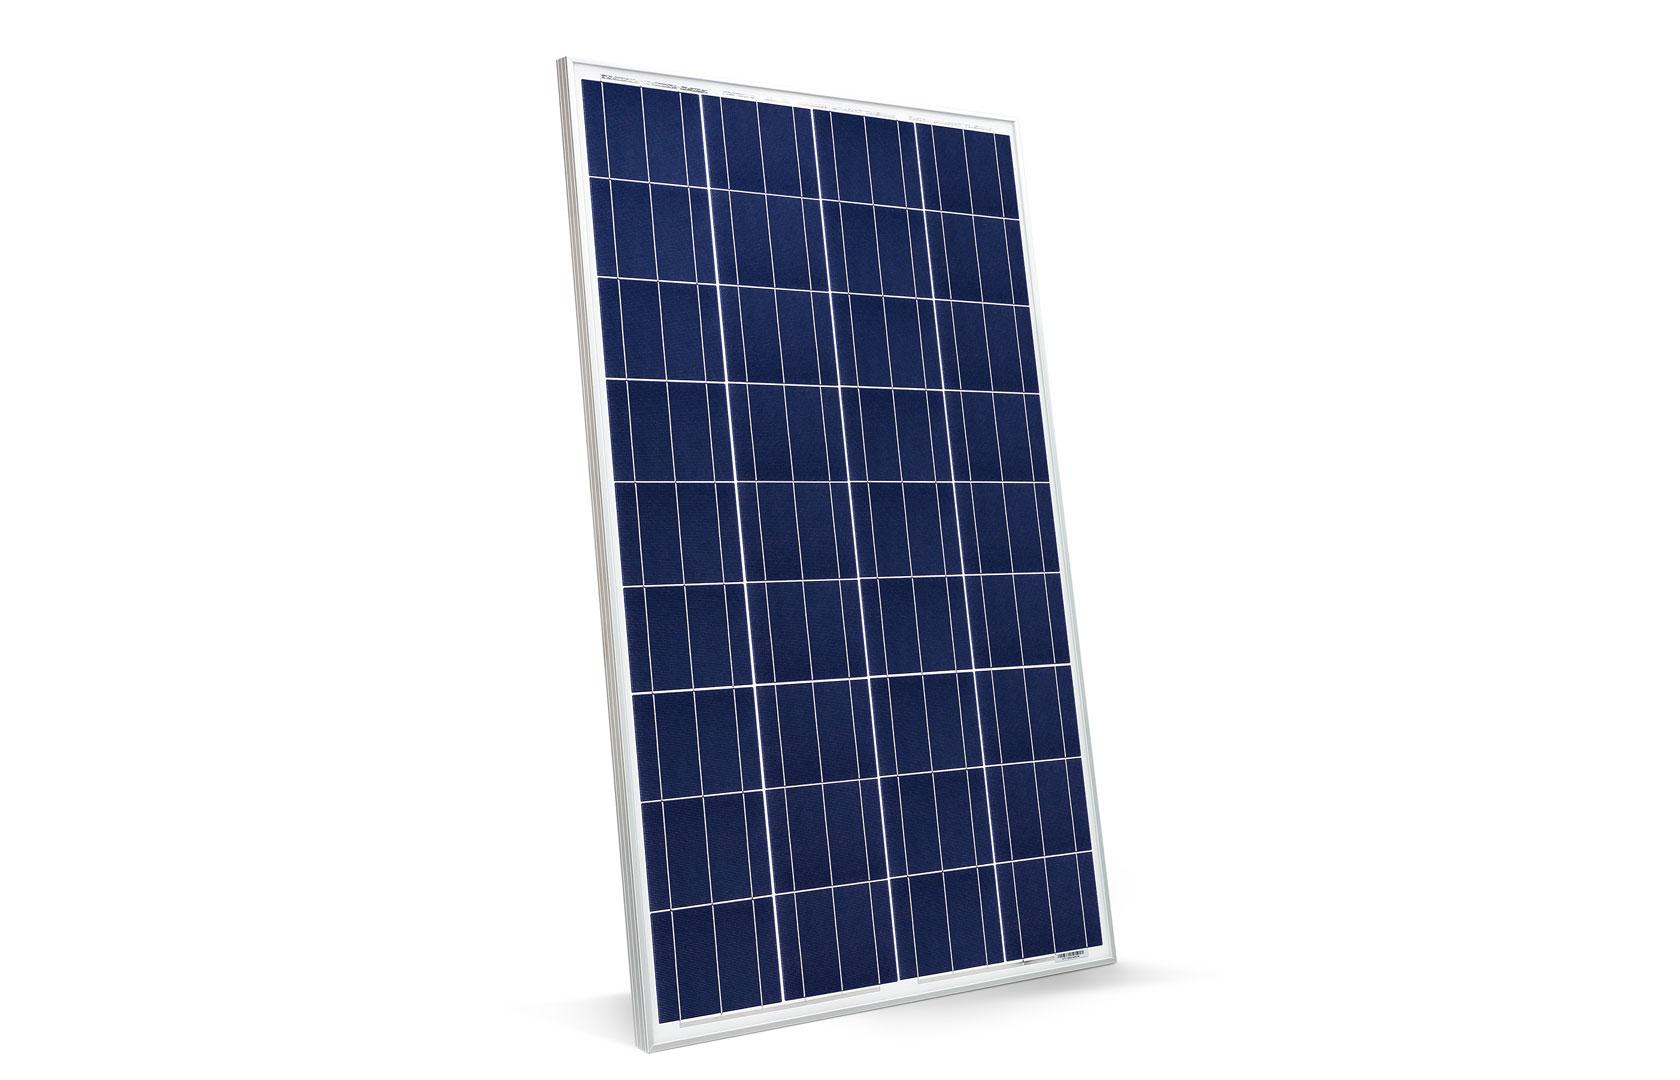 Rigid Glass Solar Panel